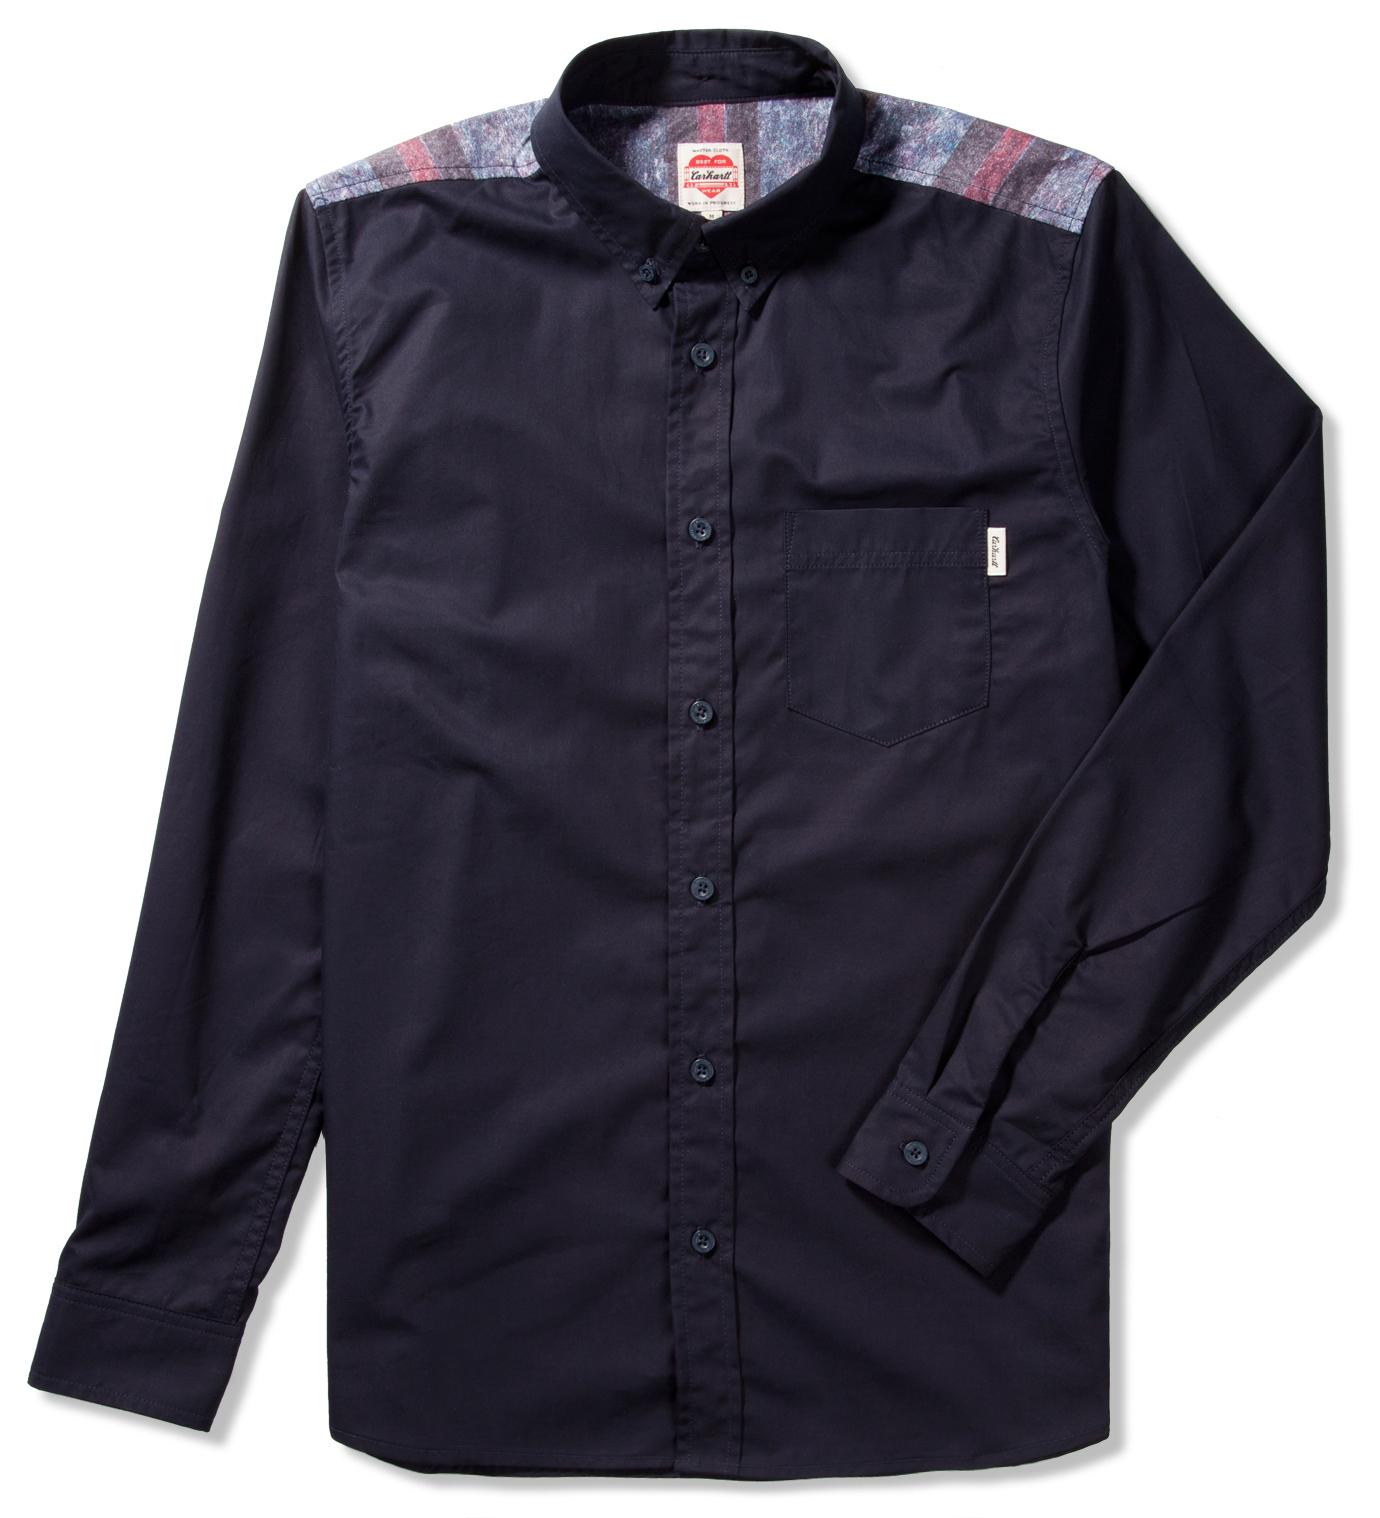 Carhartt Heritage Heritage Dark Navy Baily Shirt